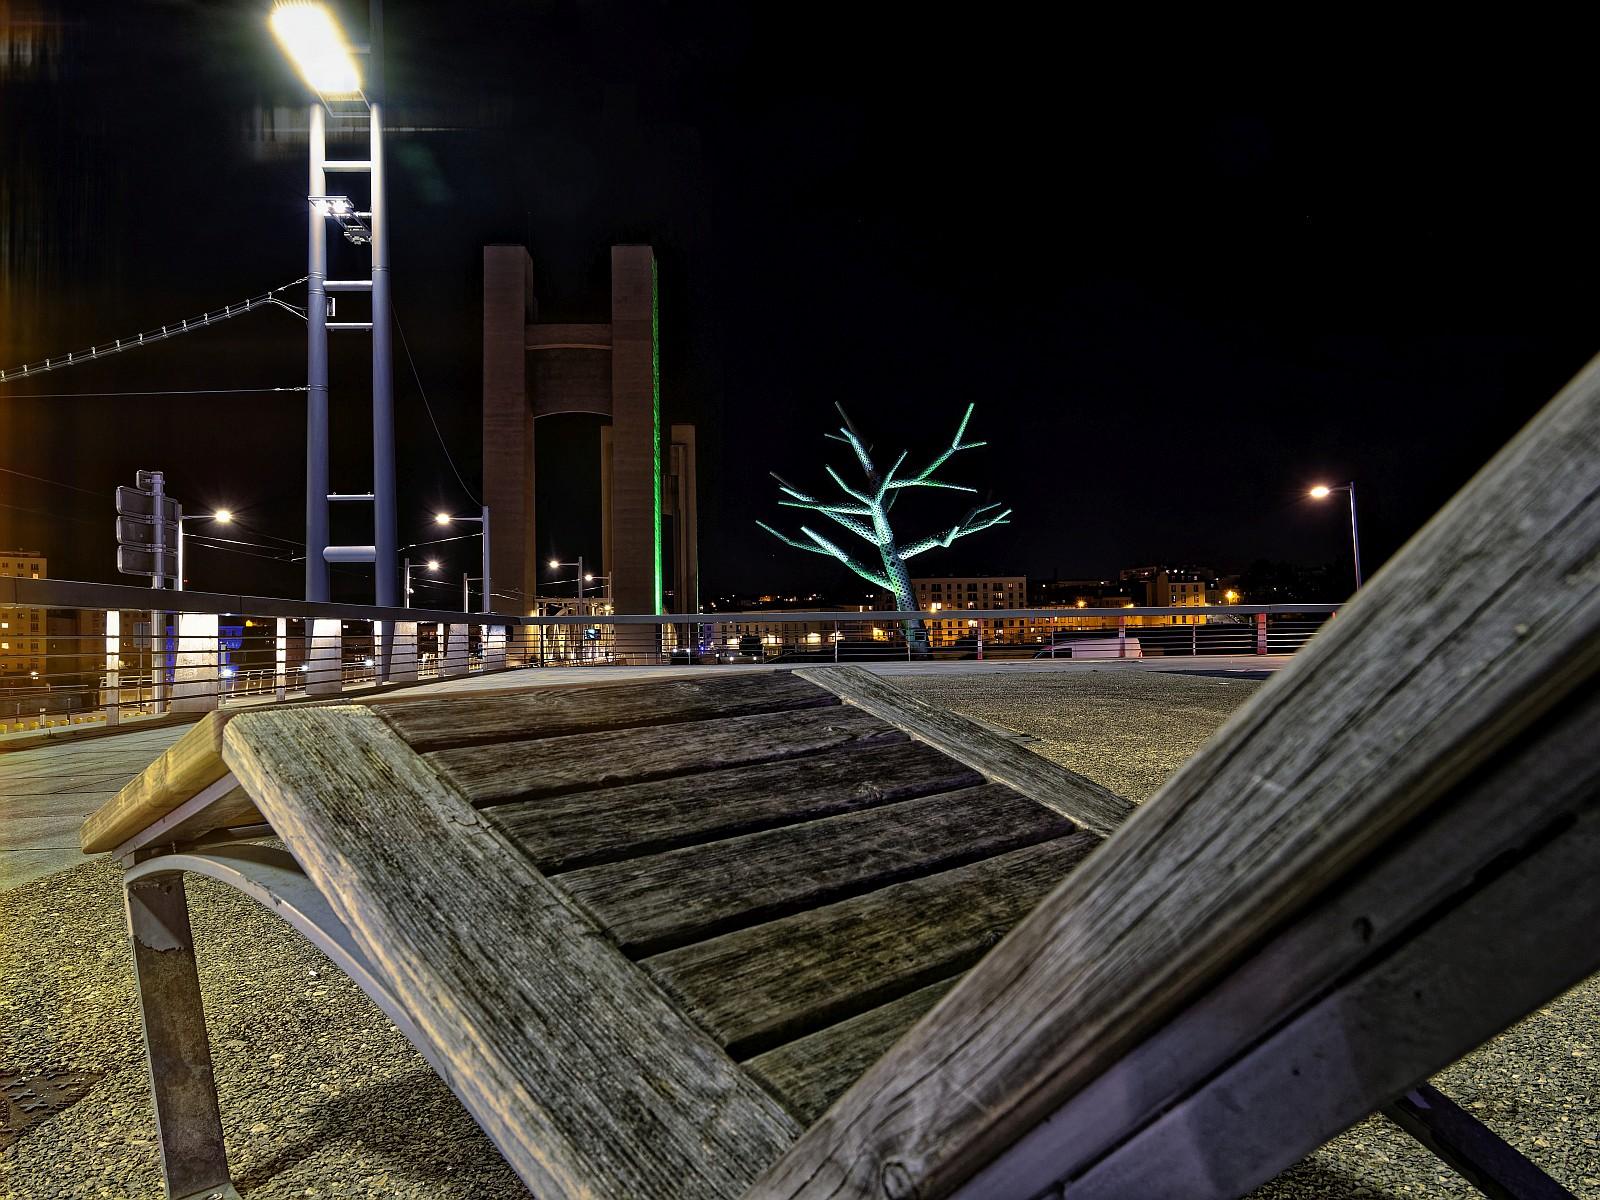 Brest, Bretagne, Brittany, night, Noctambulages, Noctambule, nuit, Street Life, Street photo